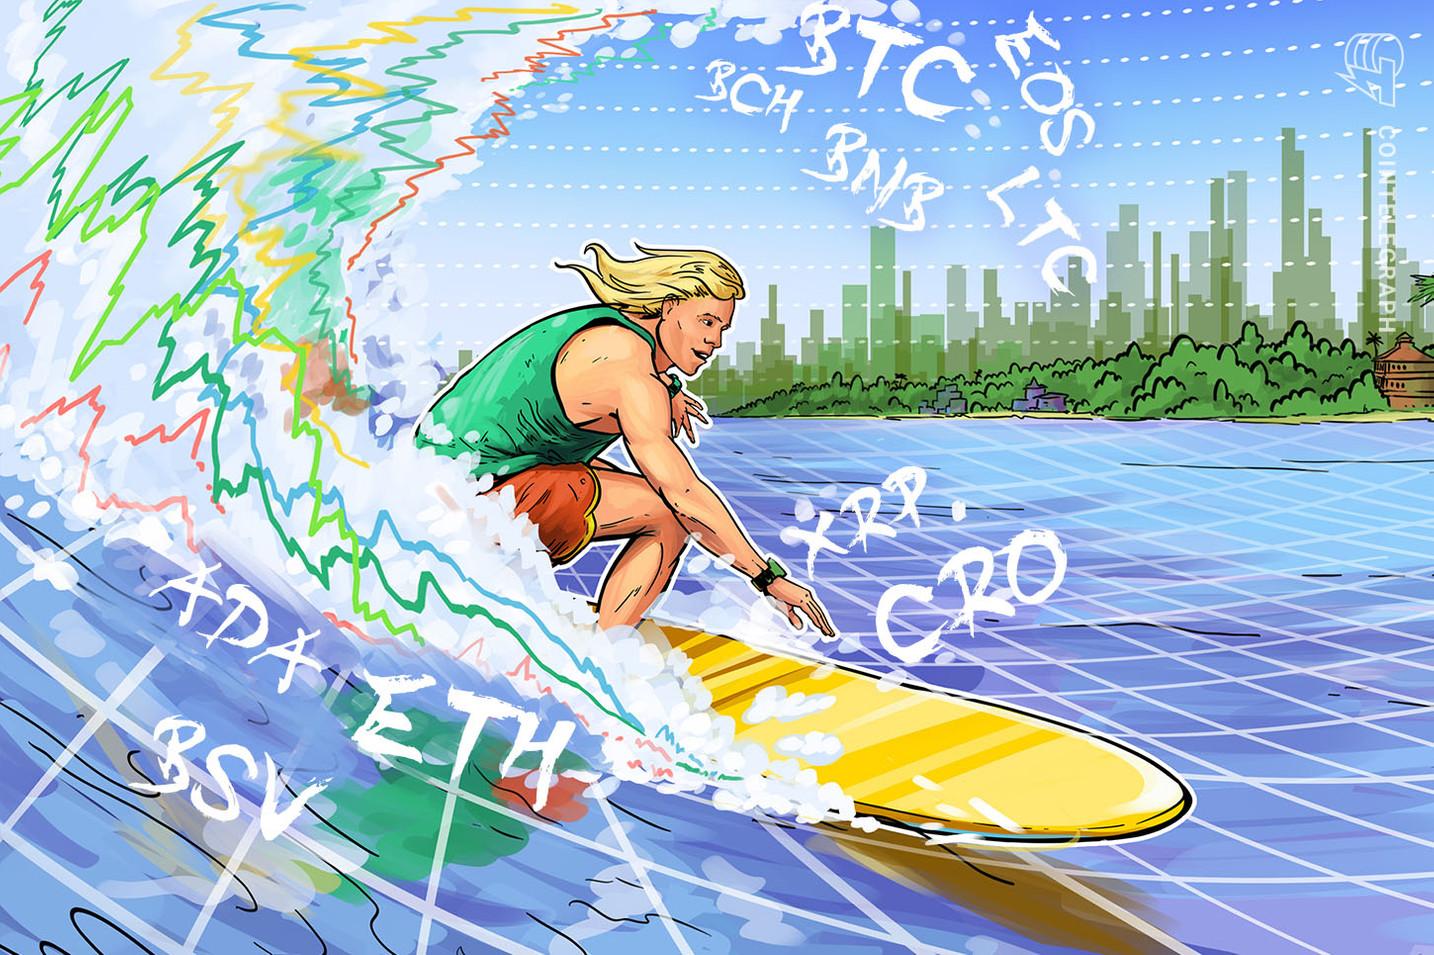 Análise de preços do Top 10 (6/7): BTC, ETH, XRP, BCH, BSV, LTC, ADA, BNB, CRO, EOS